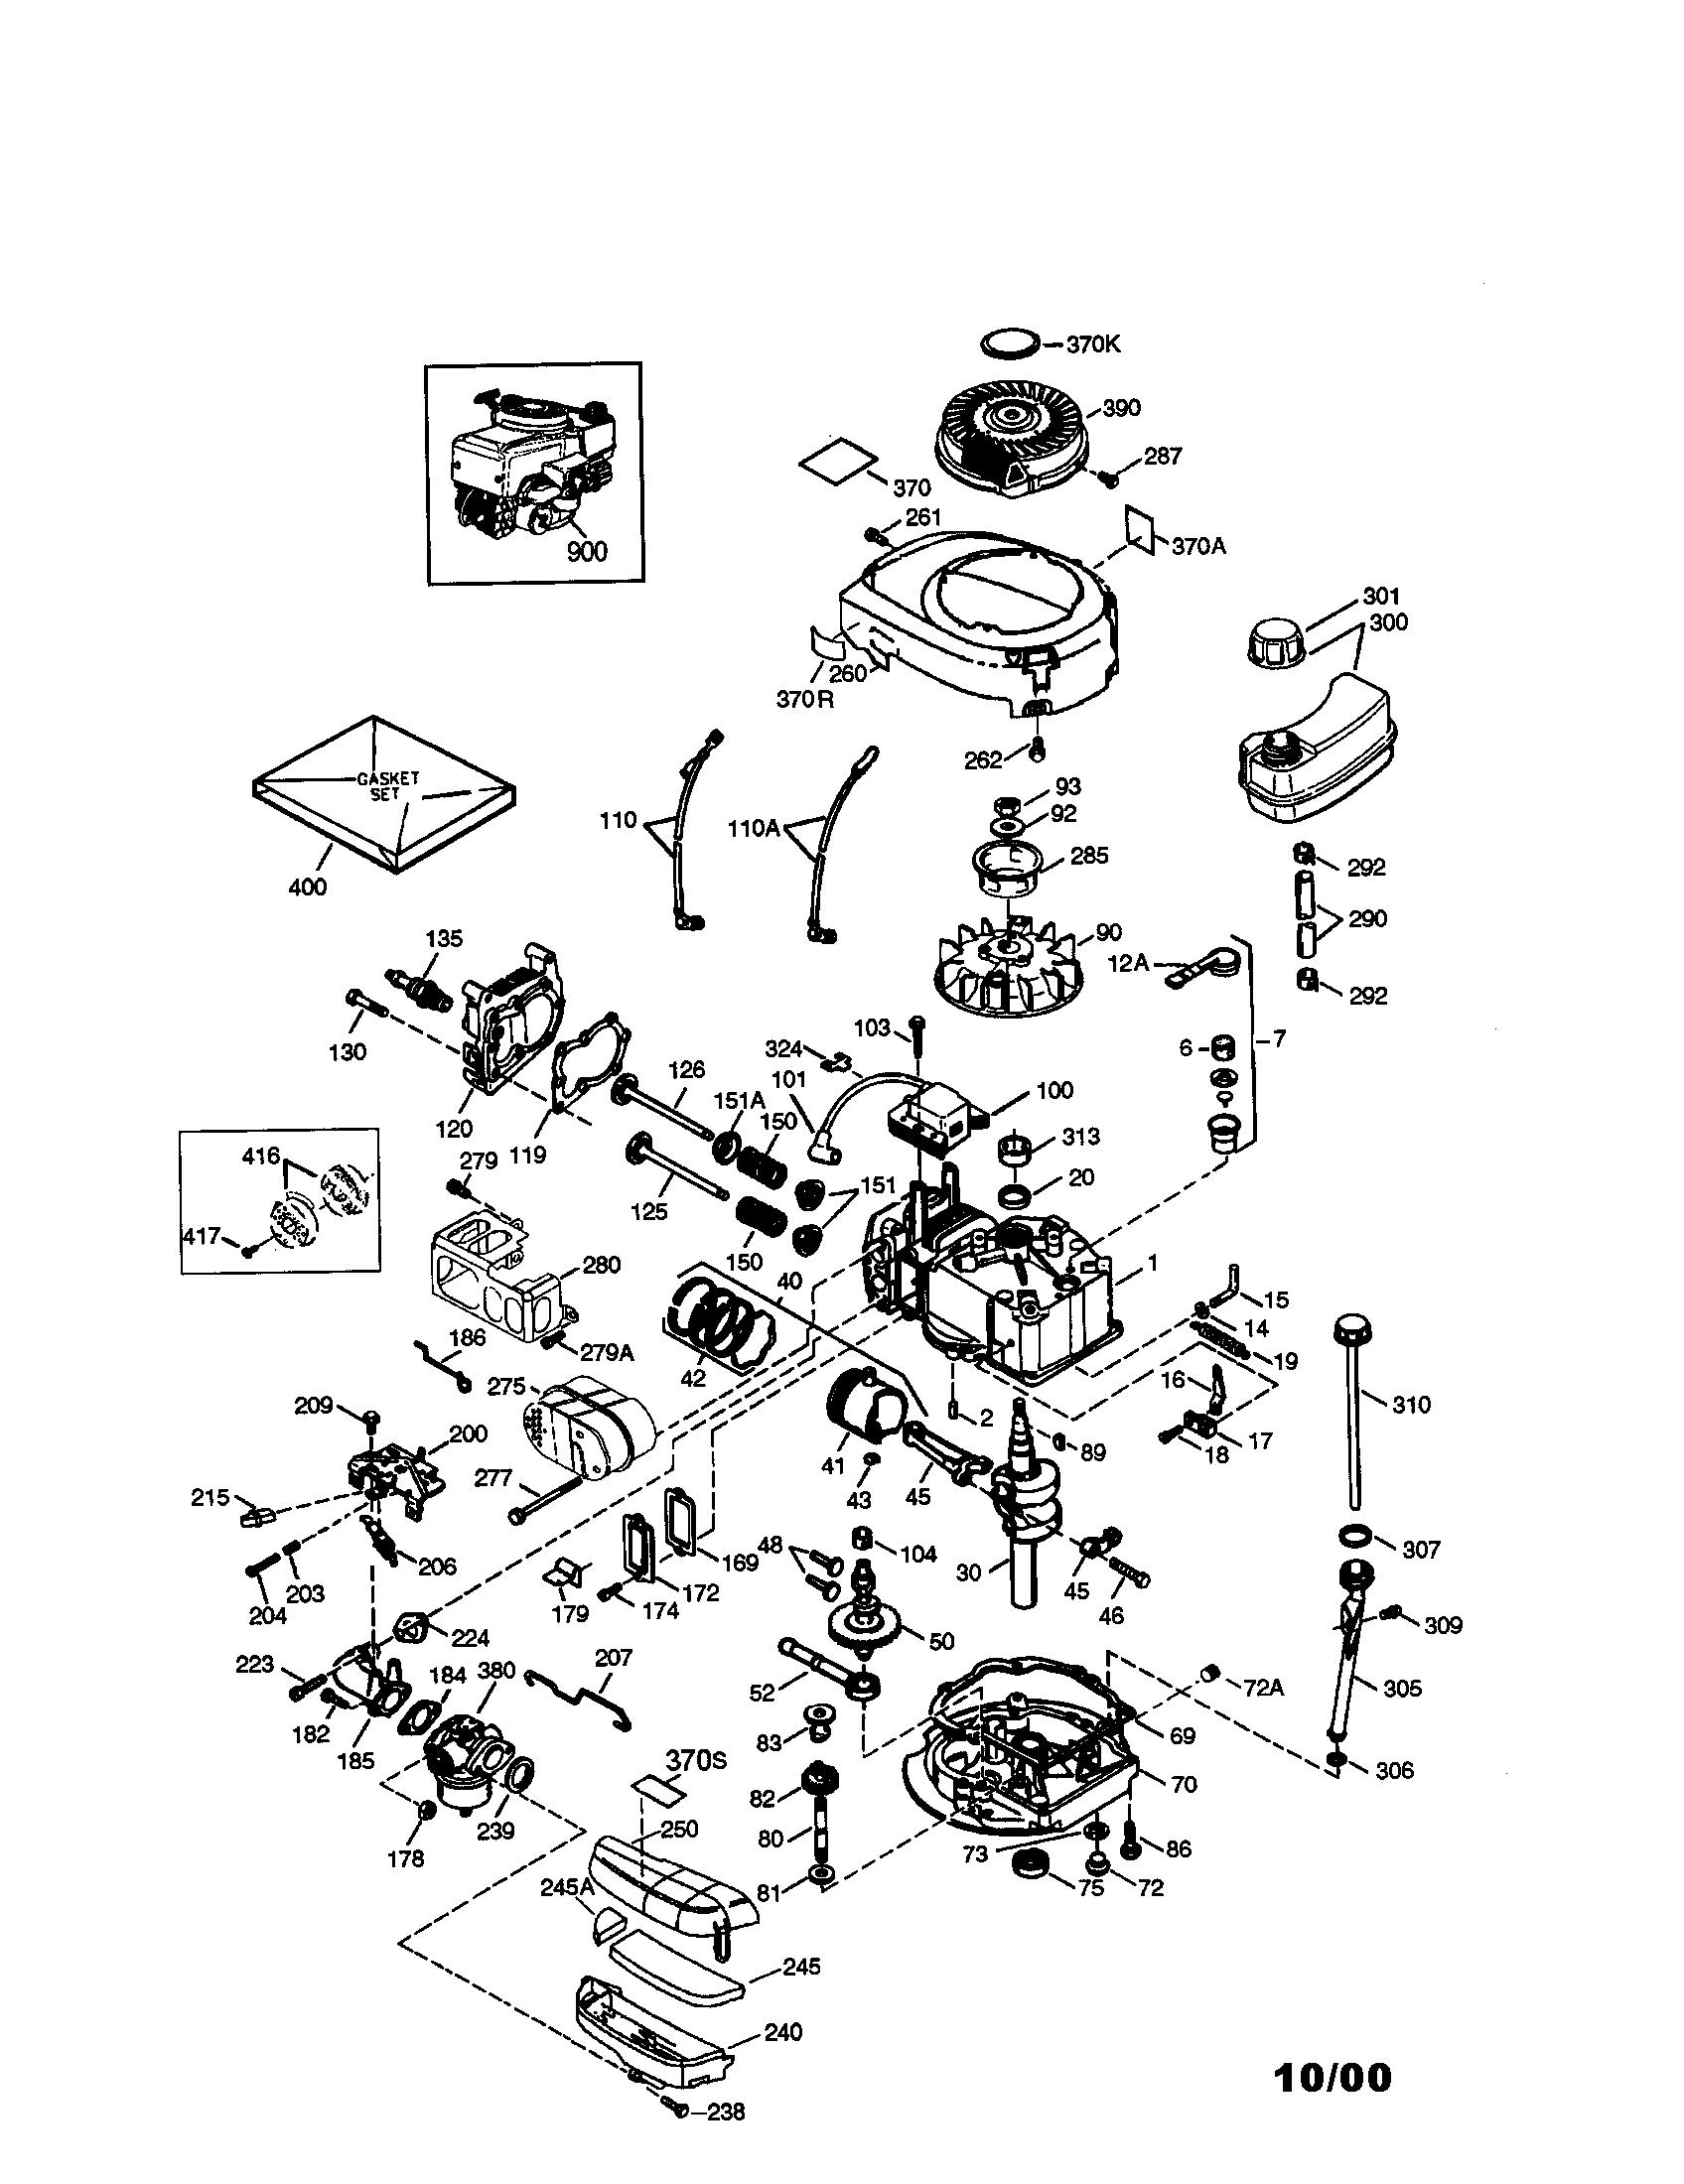 Craftsman model 143004500 engine genuine parts p0010532 00001 1503500html engine carburetor diagram engine carburetor diagram